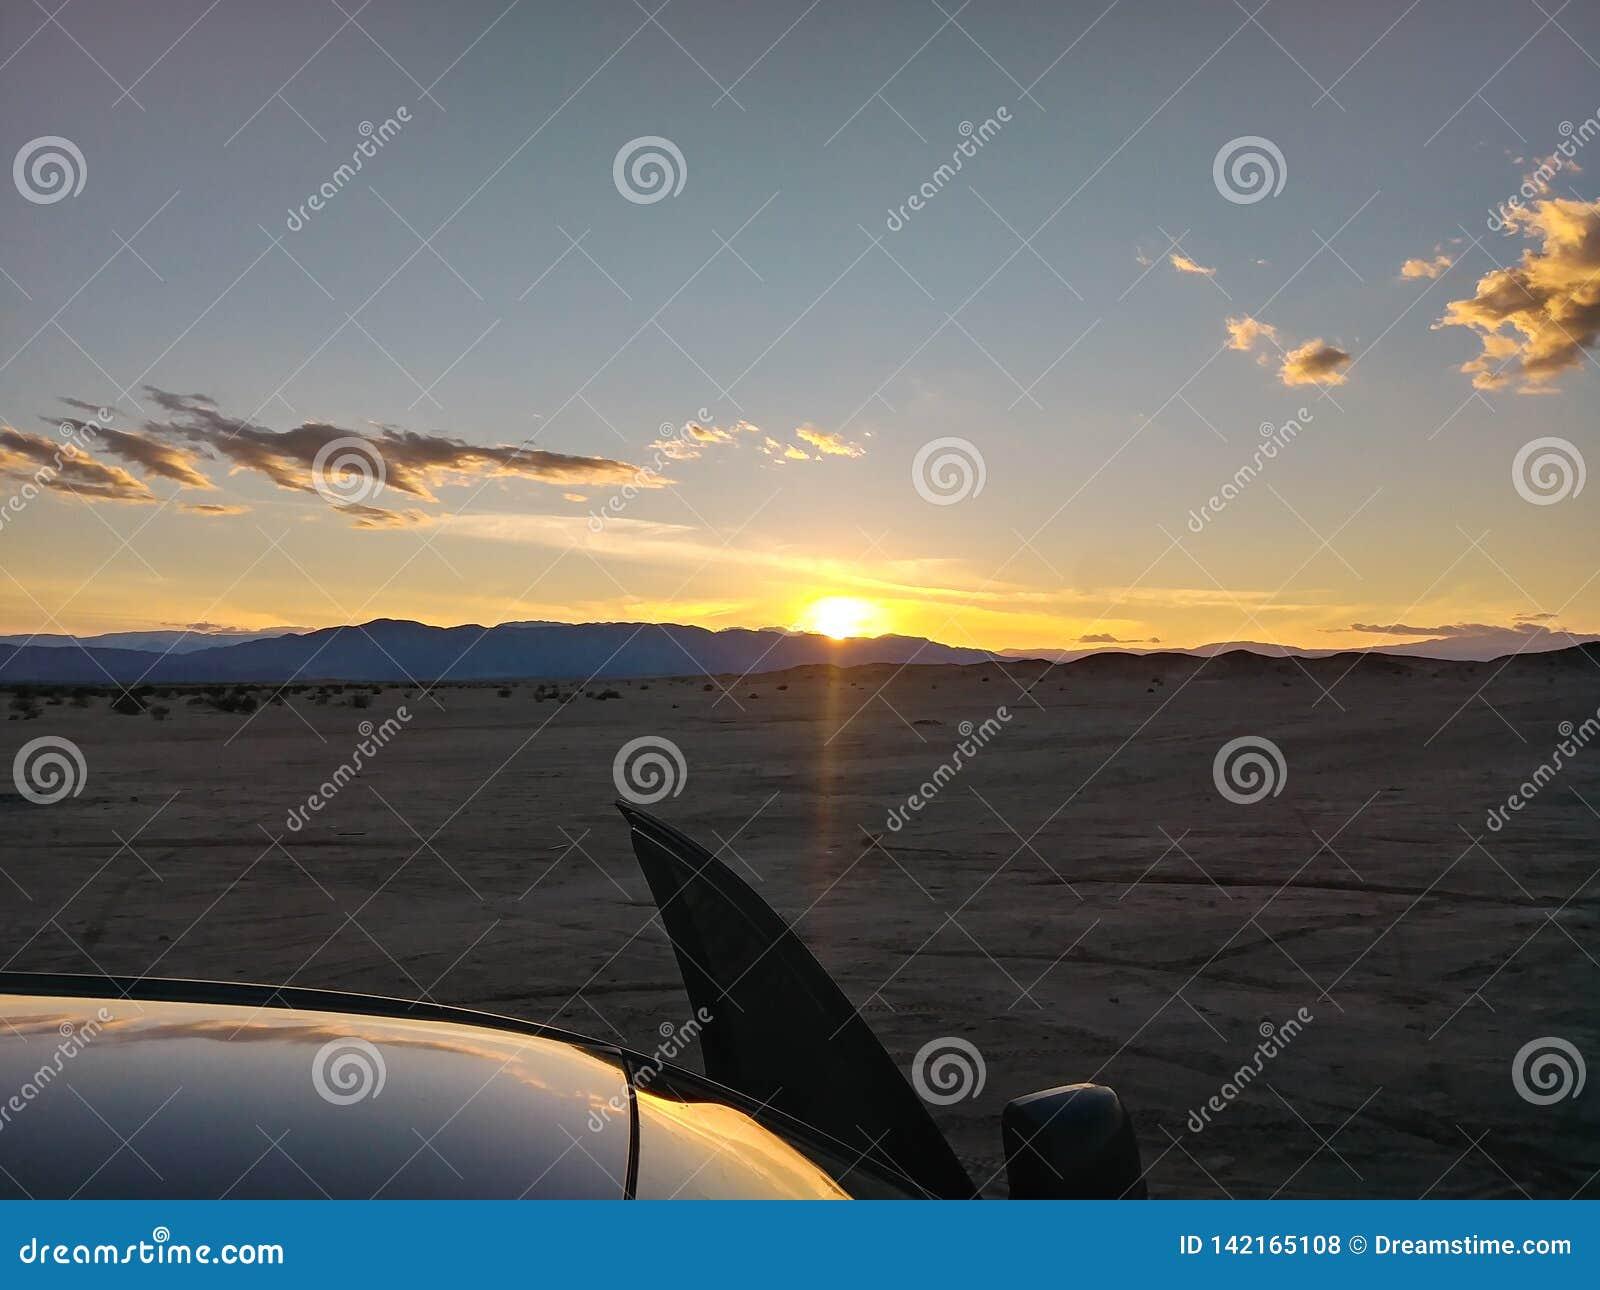 Ocotillo wells sunset.